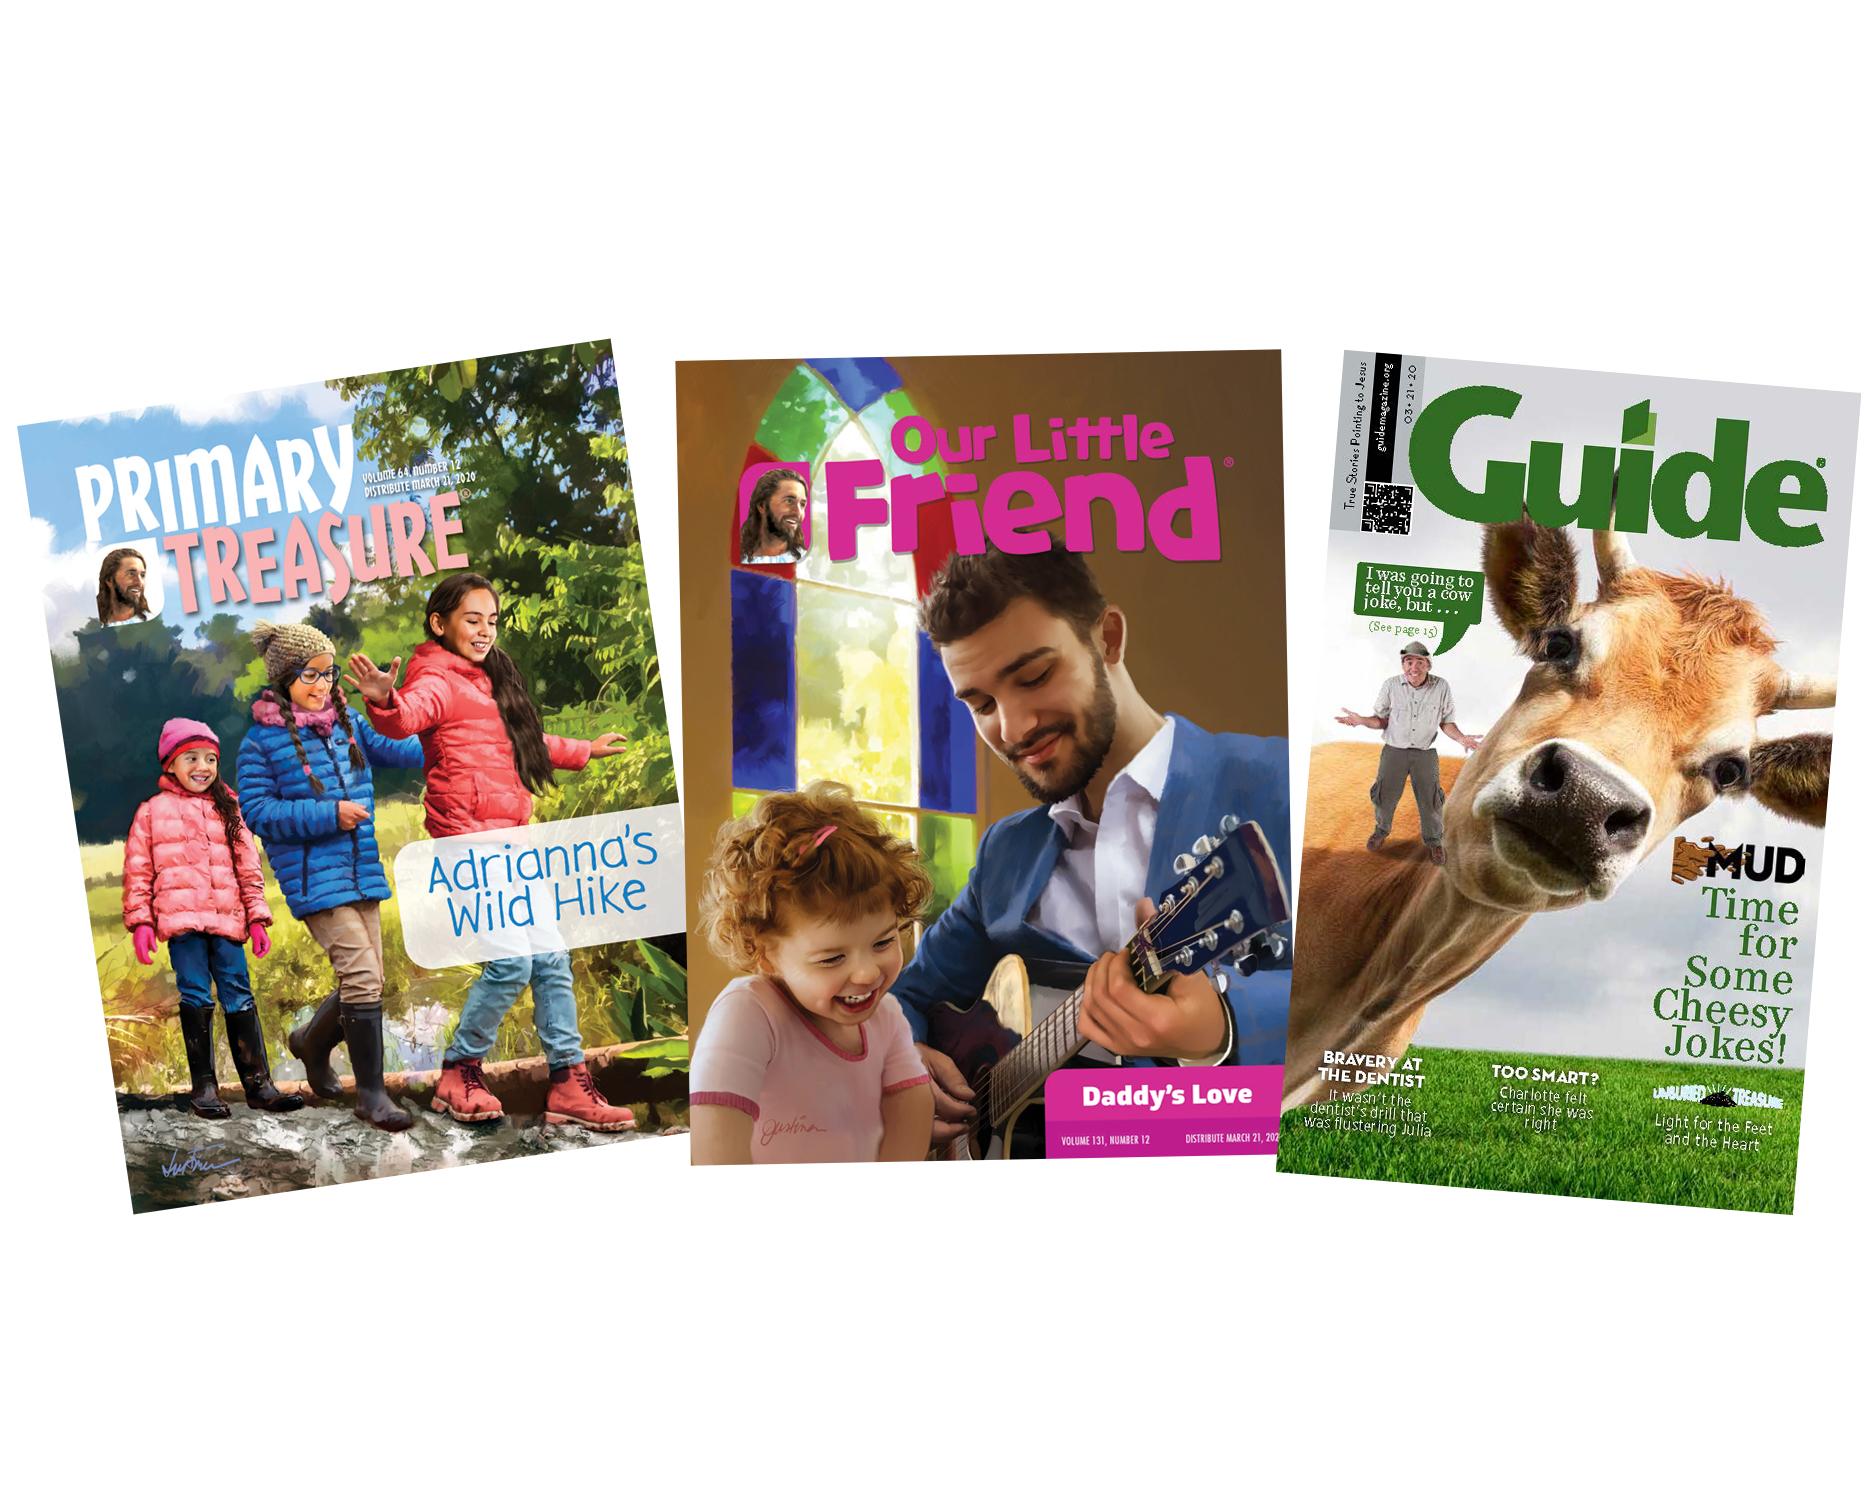 Pacific Press kids' magazines